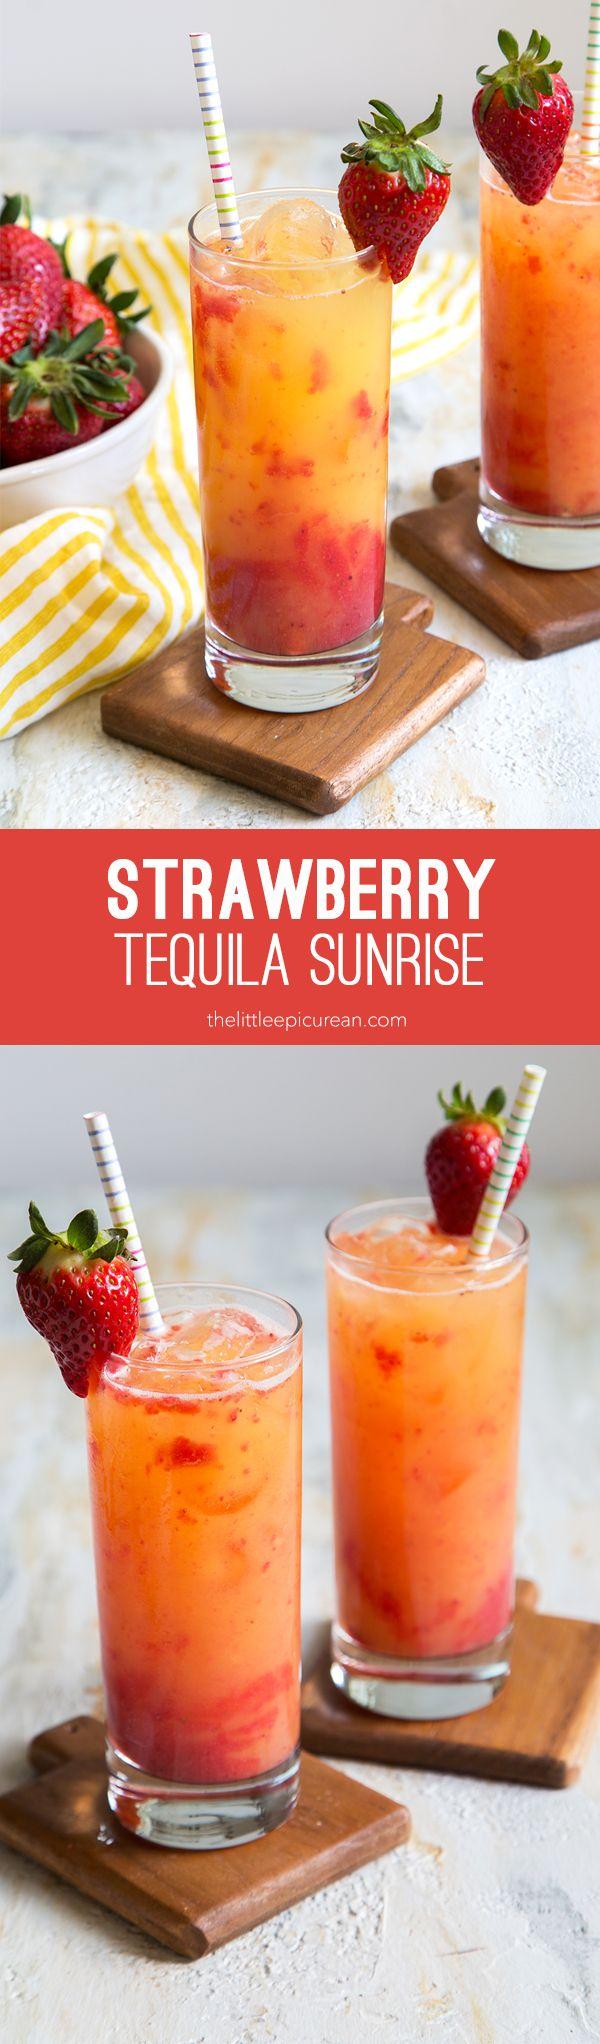 Strawberry Tequila Sunrise #tequiladrinks